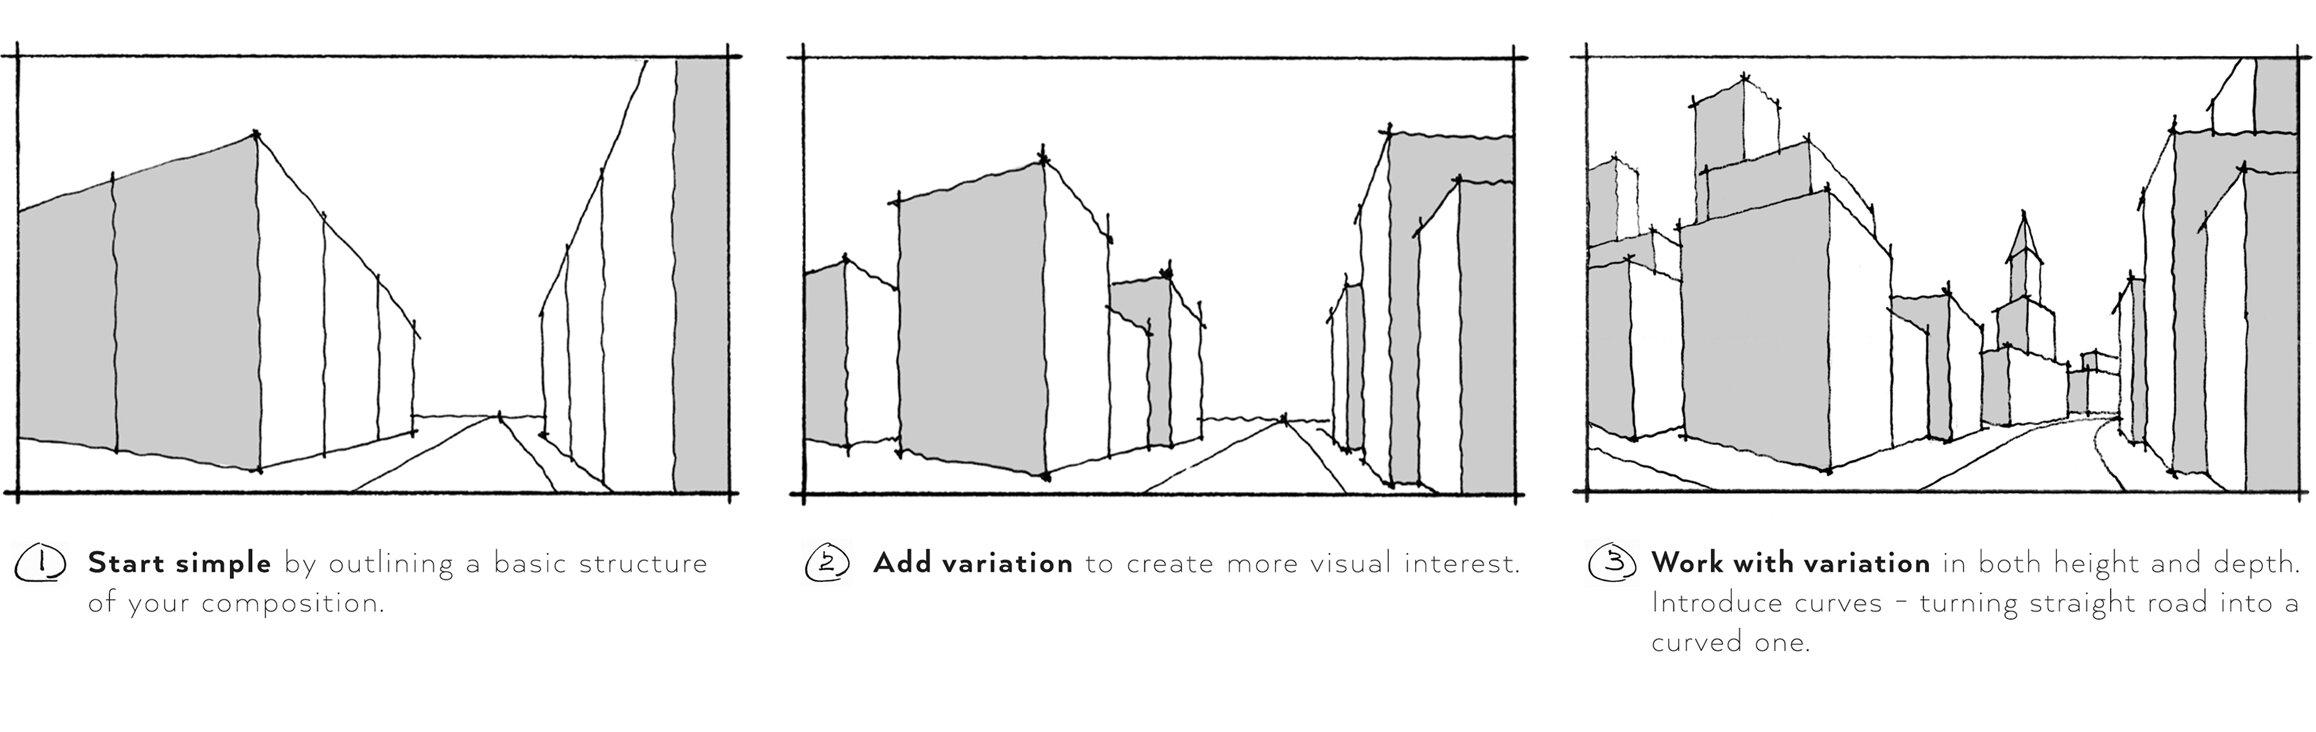 3_Steps_Overview.jpg